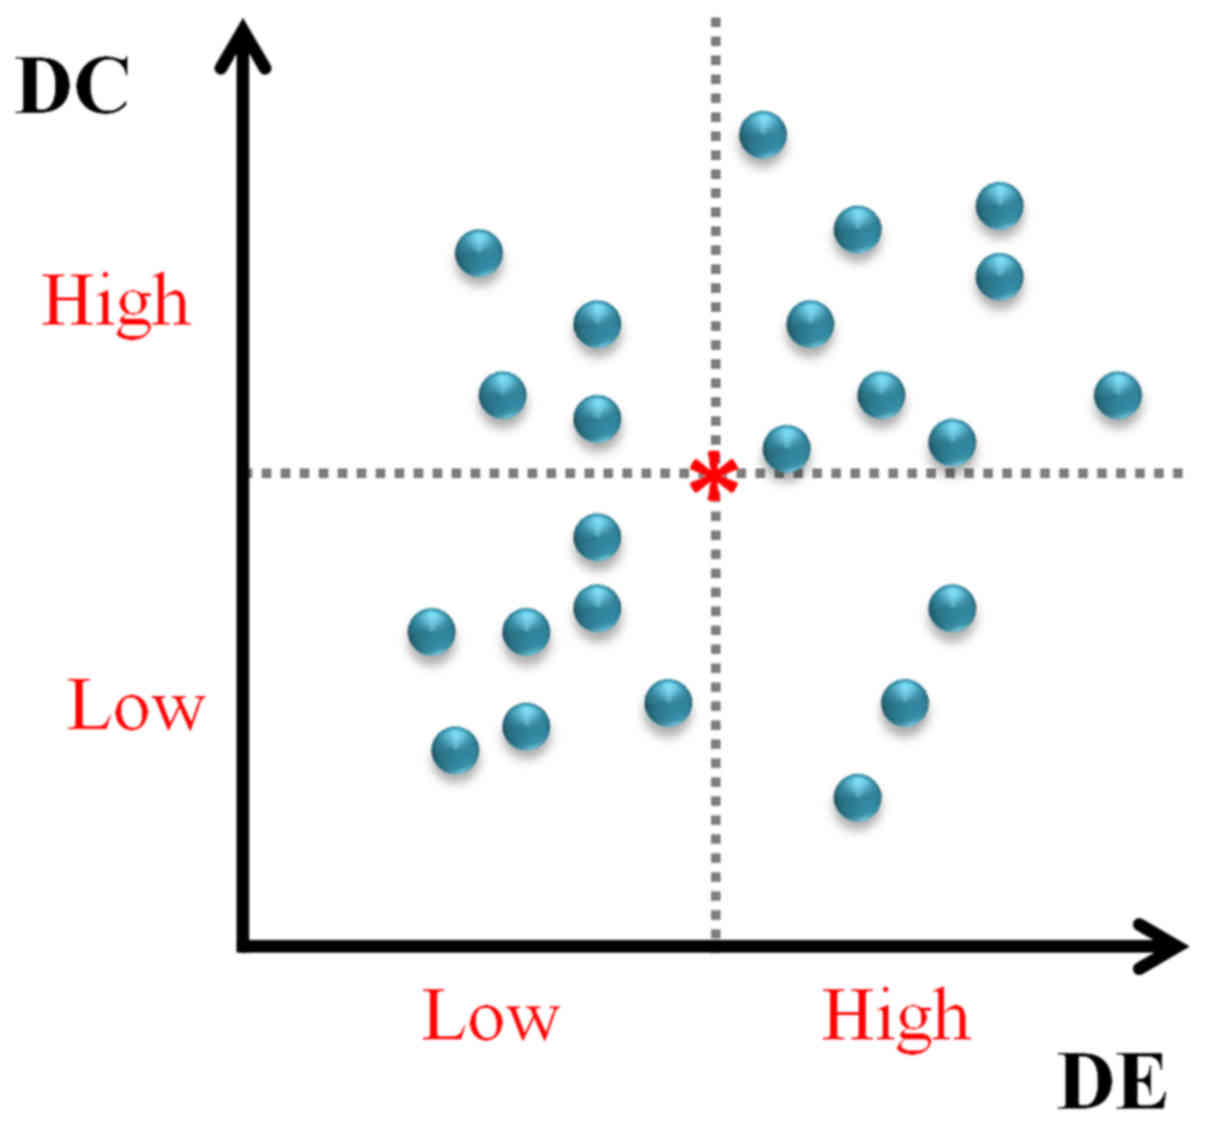 Identifying the optimal gene and gene set in hepatocellular